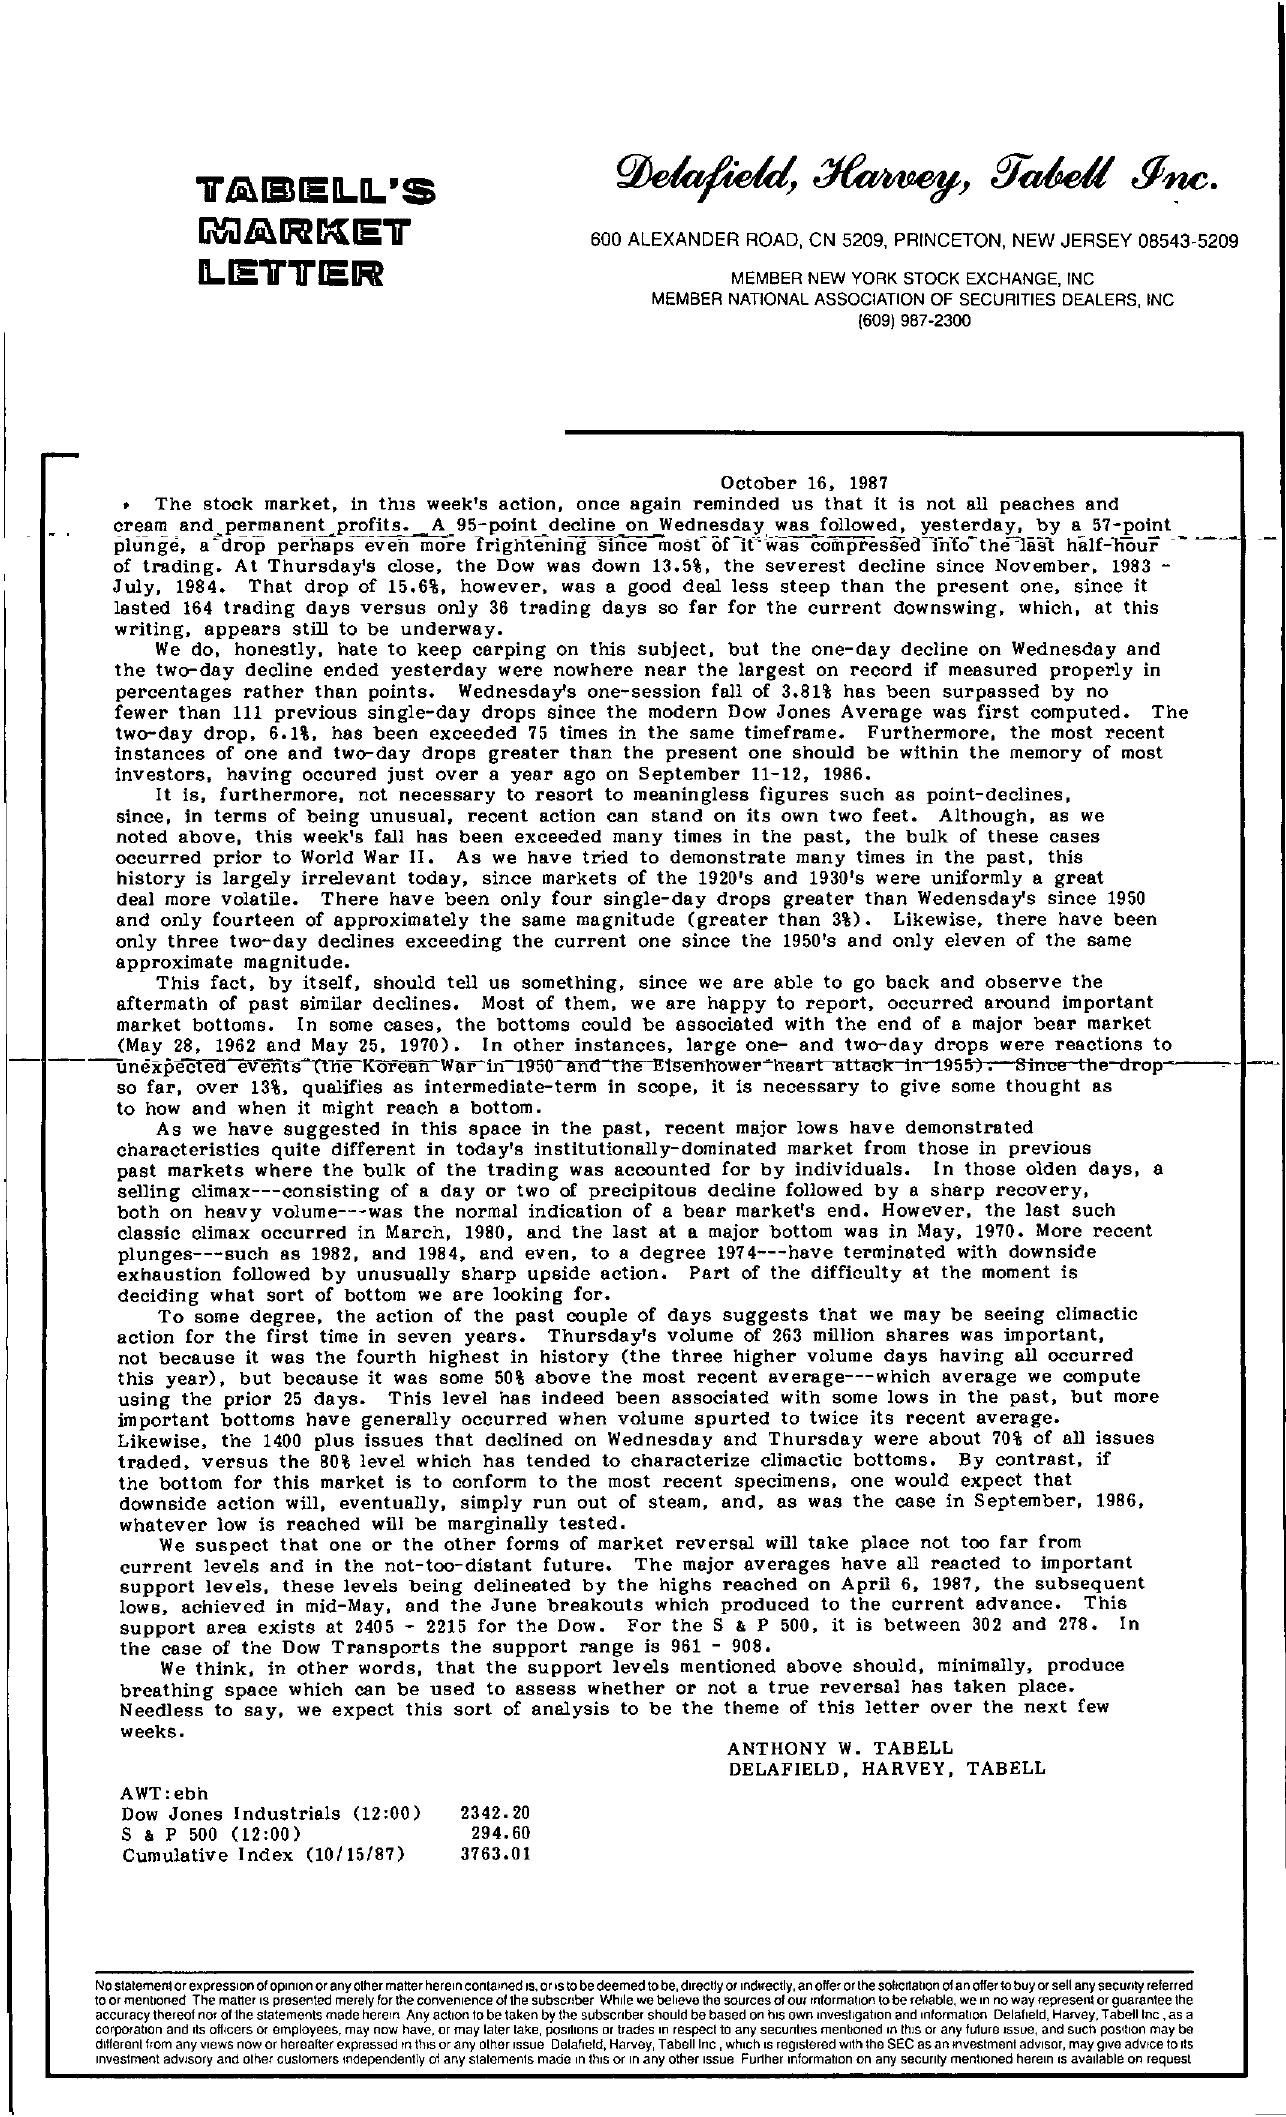 Tabell's Market Letter - October 16, 1987